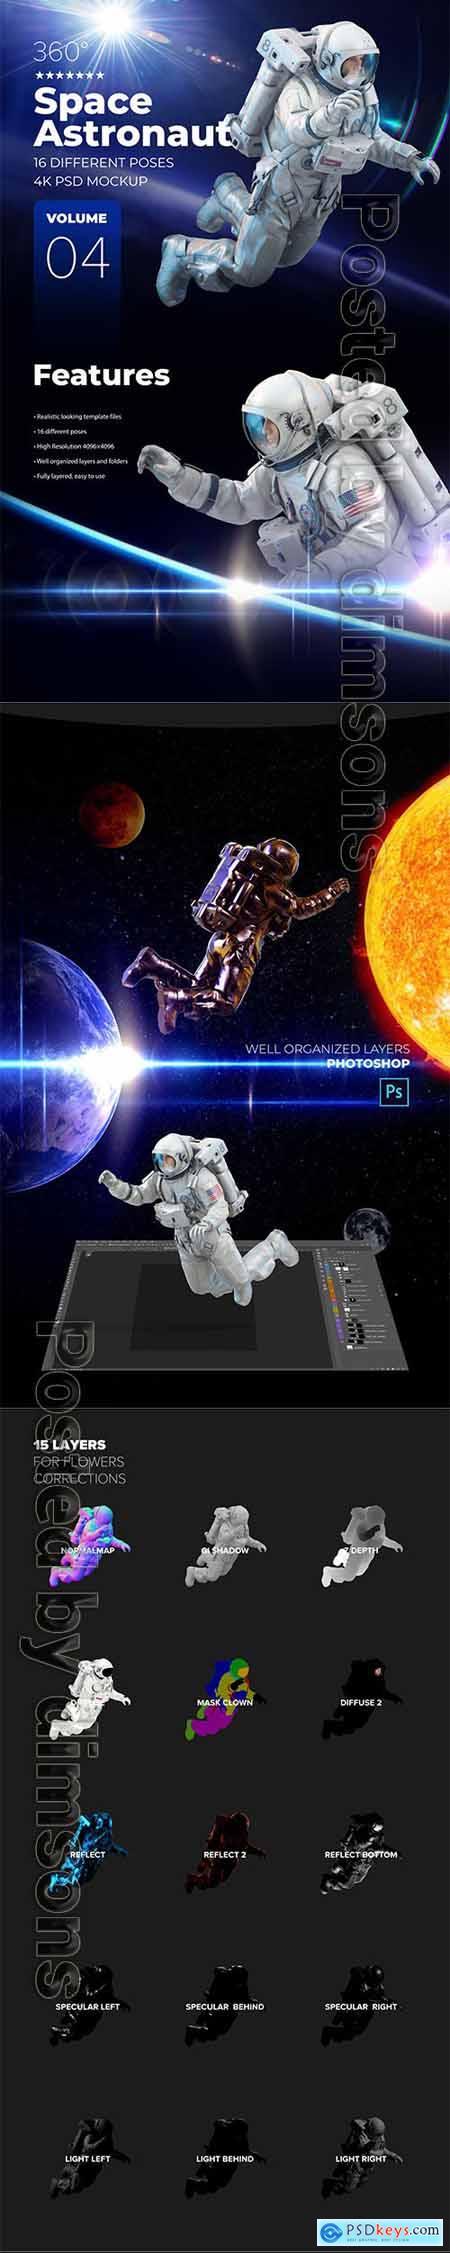 3D Mockup Space Astronaut #04 66436